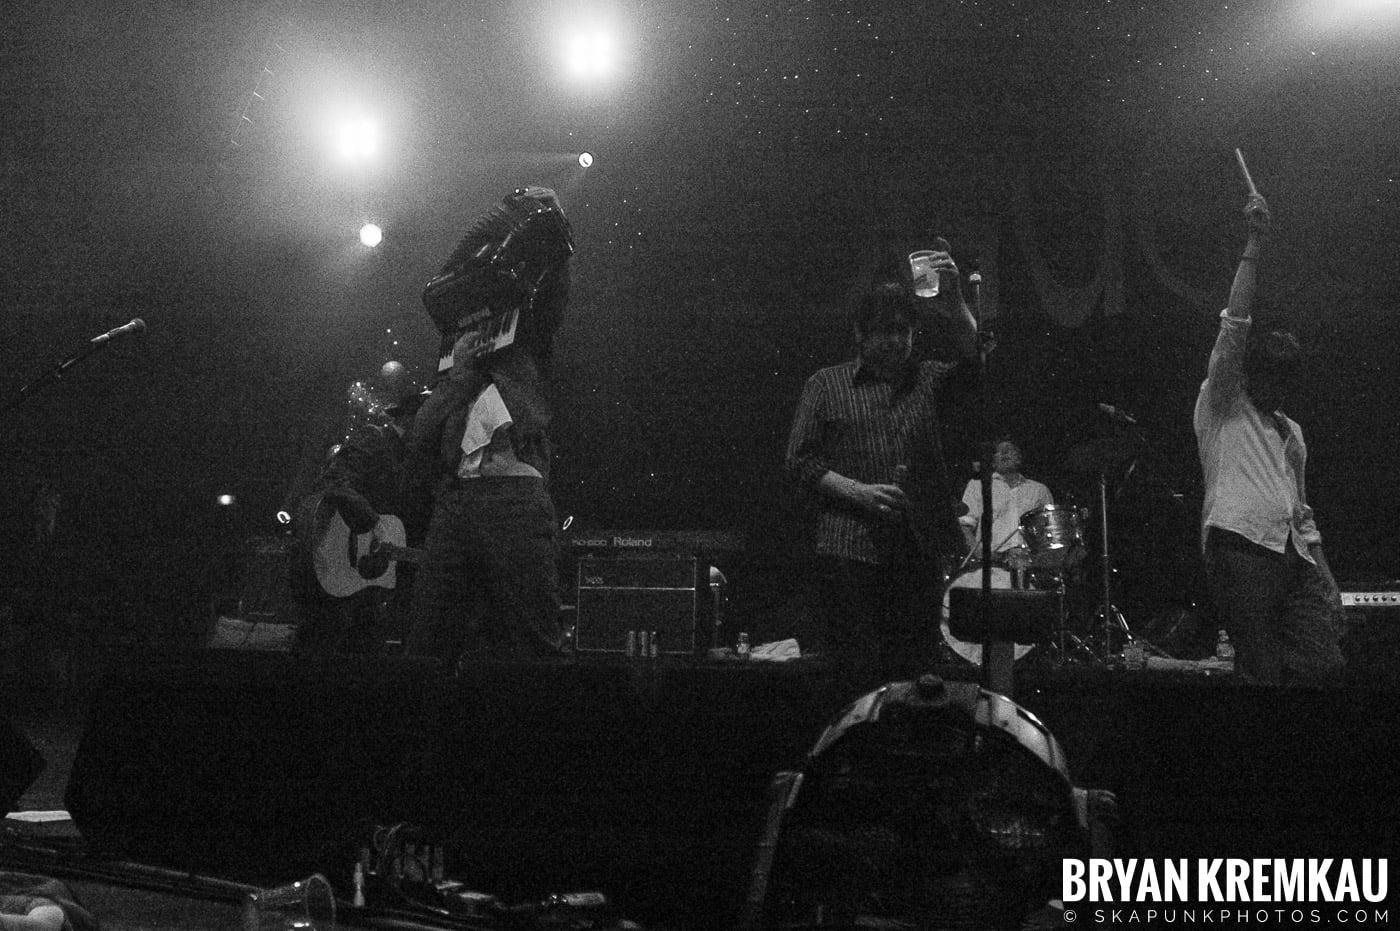 The Pogues @ Brixton Academy, London UK - 12.19.05 (19)